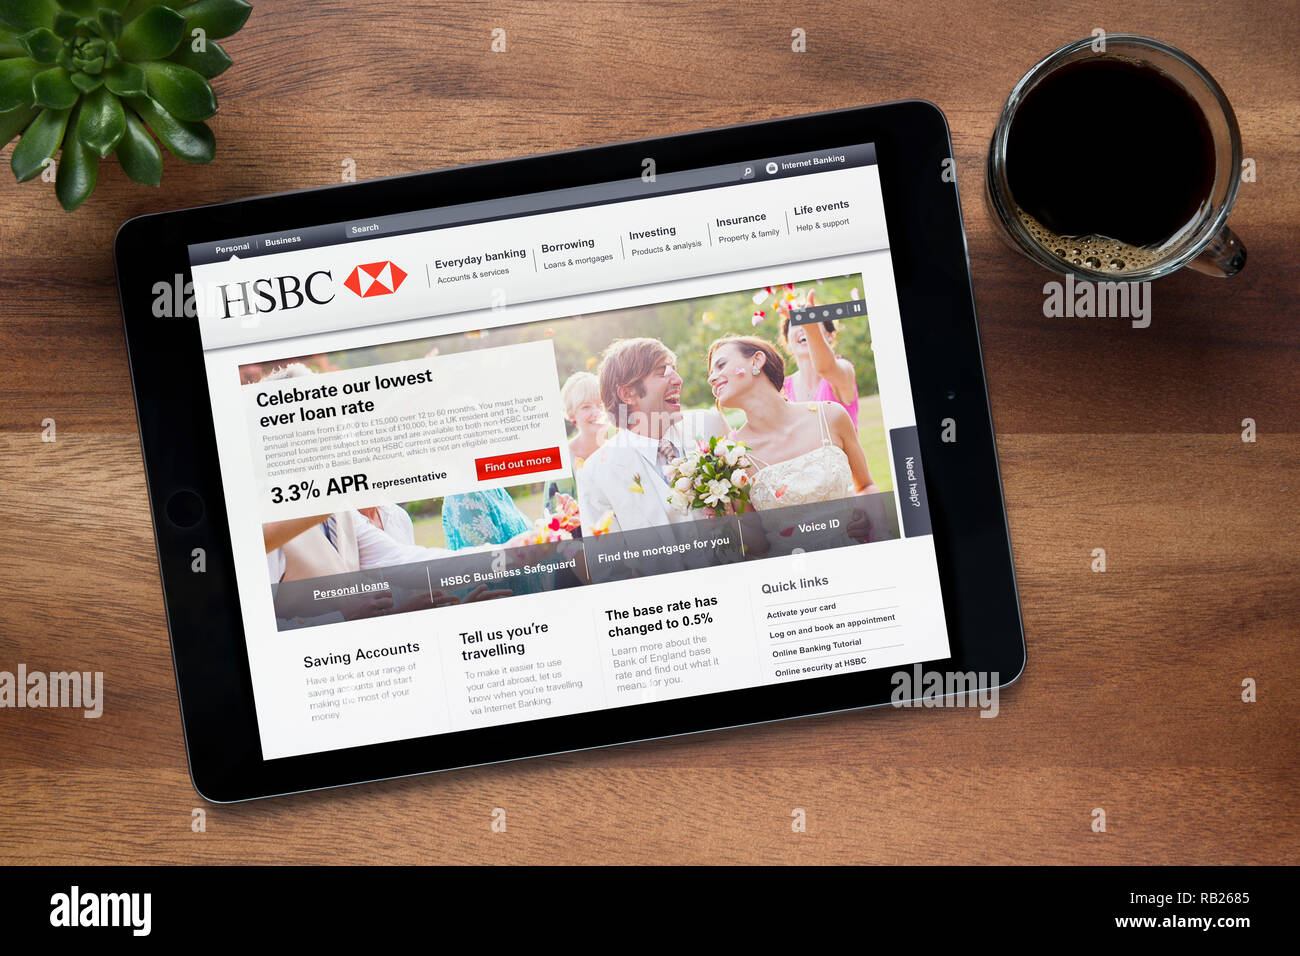 Hsbc Online Stock Photos & Hsbc Online Stock Images - Alamy